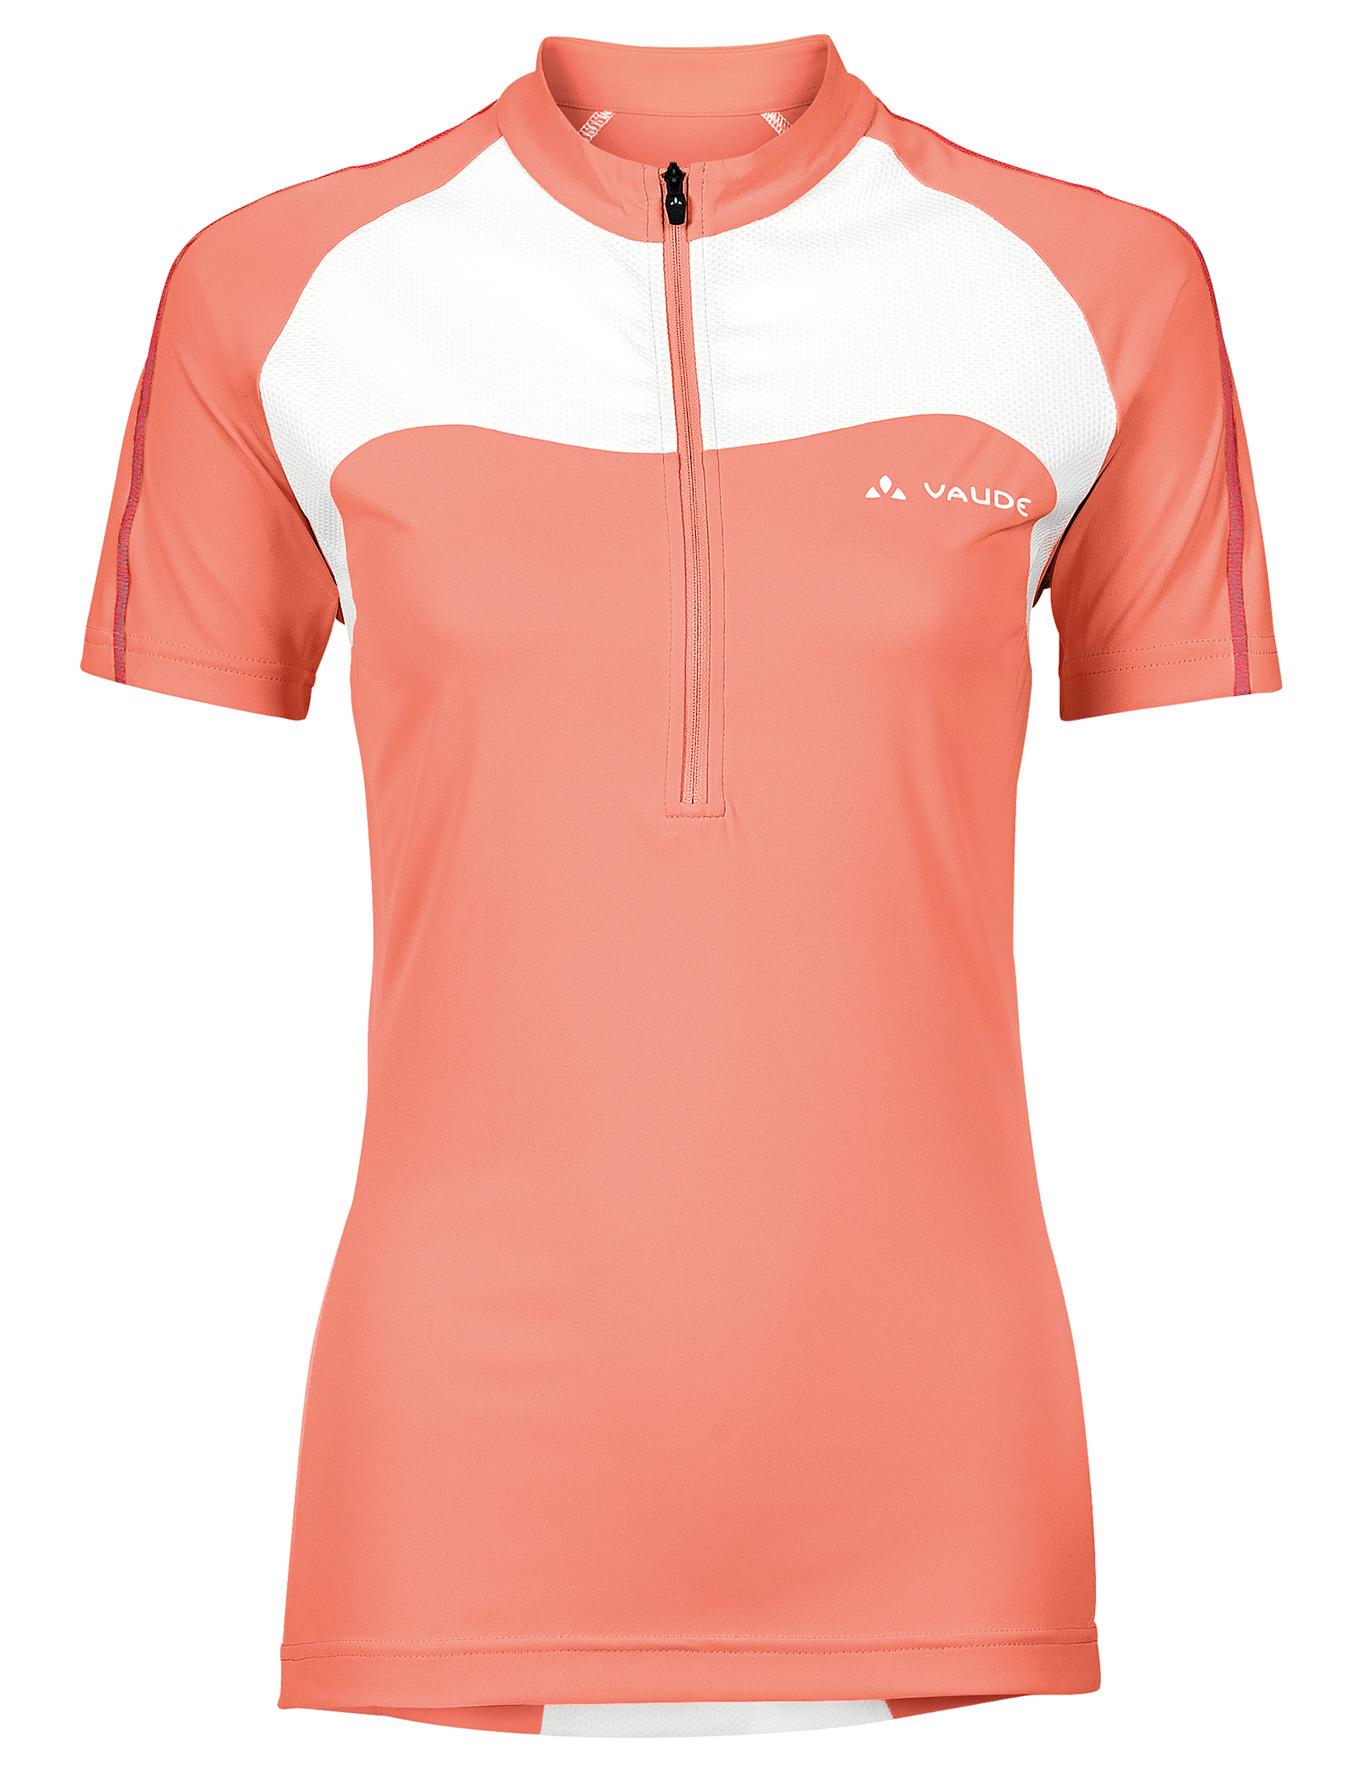 VAUDE Women´s Topa Shirt II apricot Größe 36 - schneider-sports